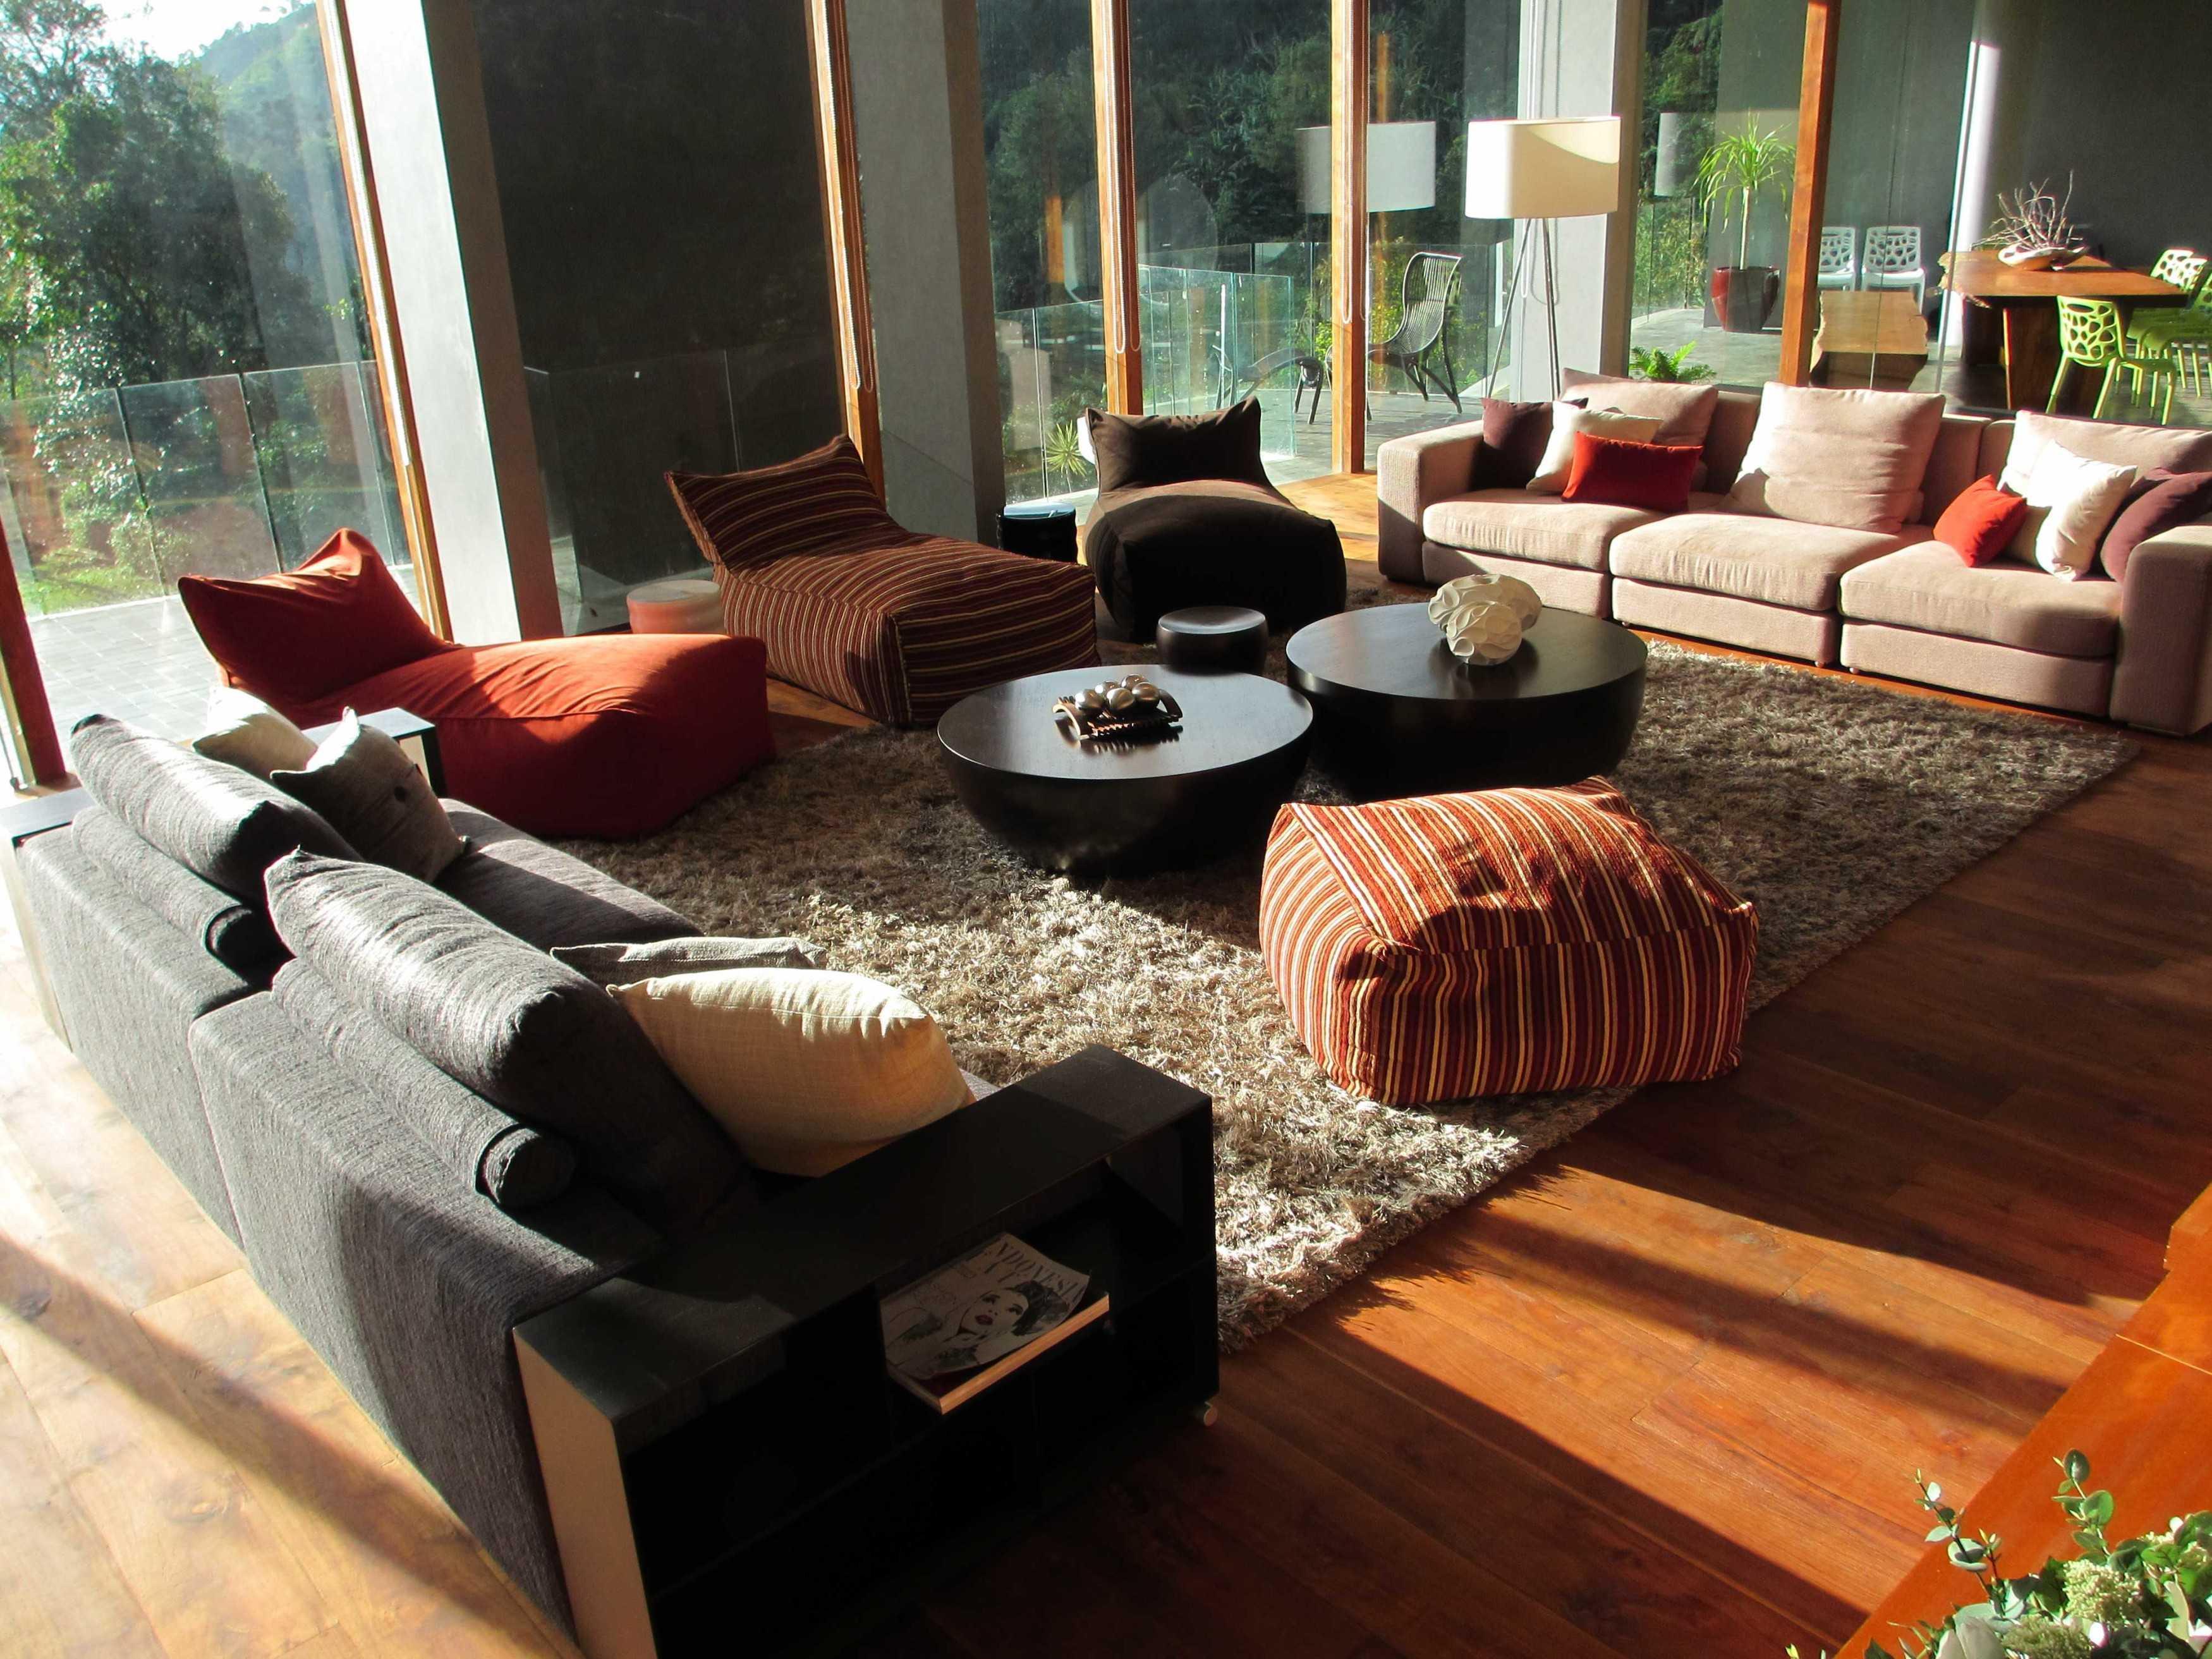 Rudy Dodo Private Villa Cilember, Puncak - Bogor Cilember, Puncak - Bogor Living Room   9182